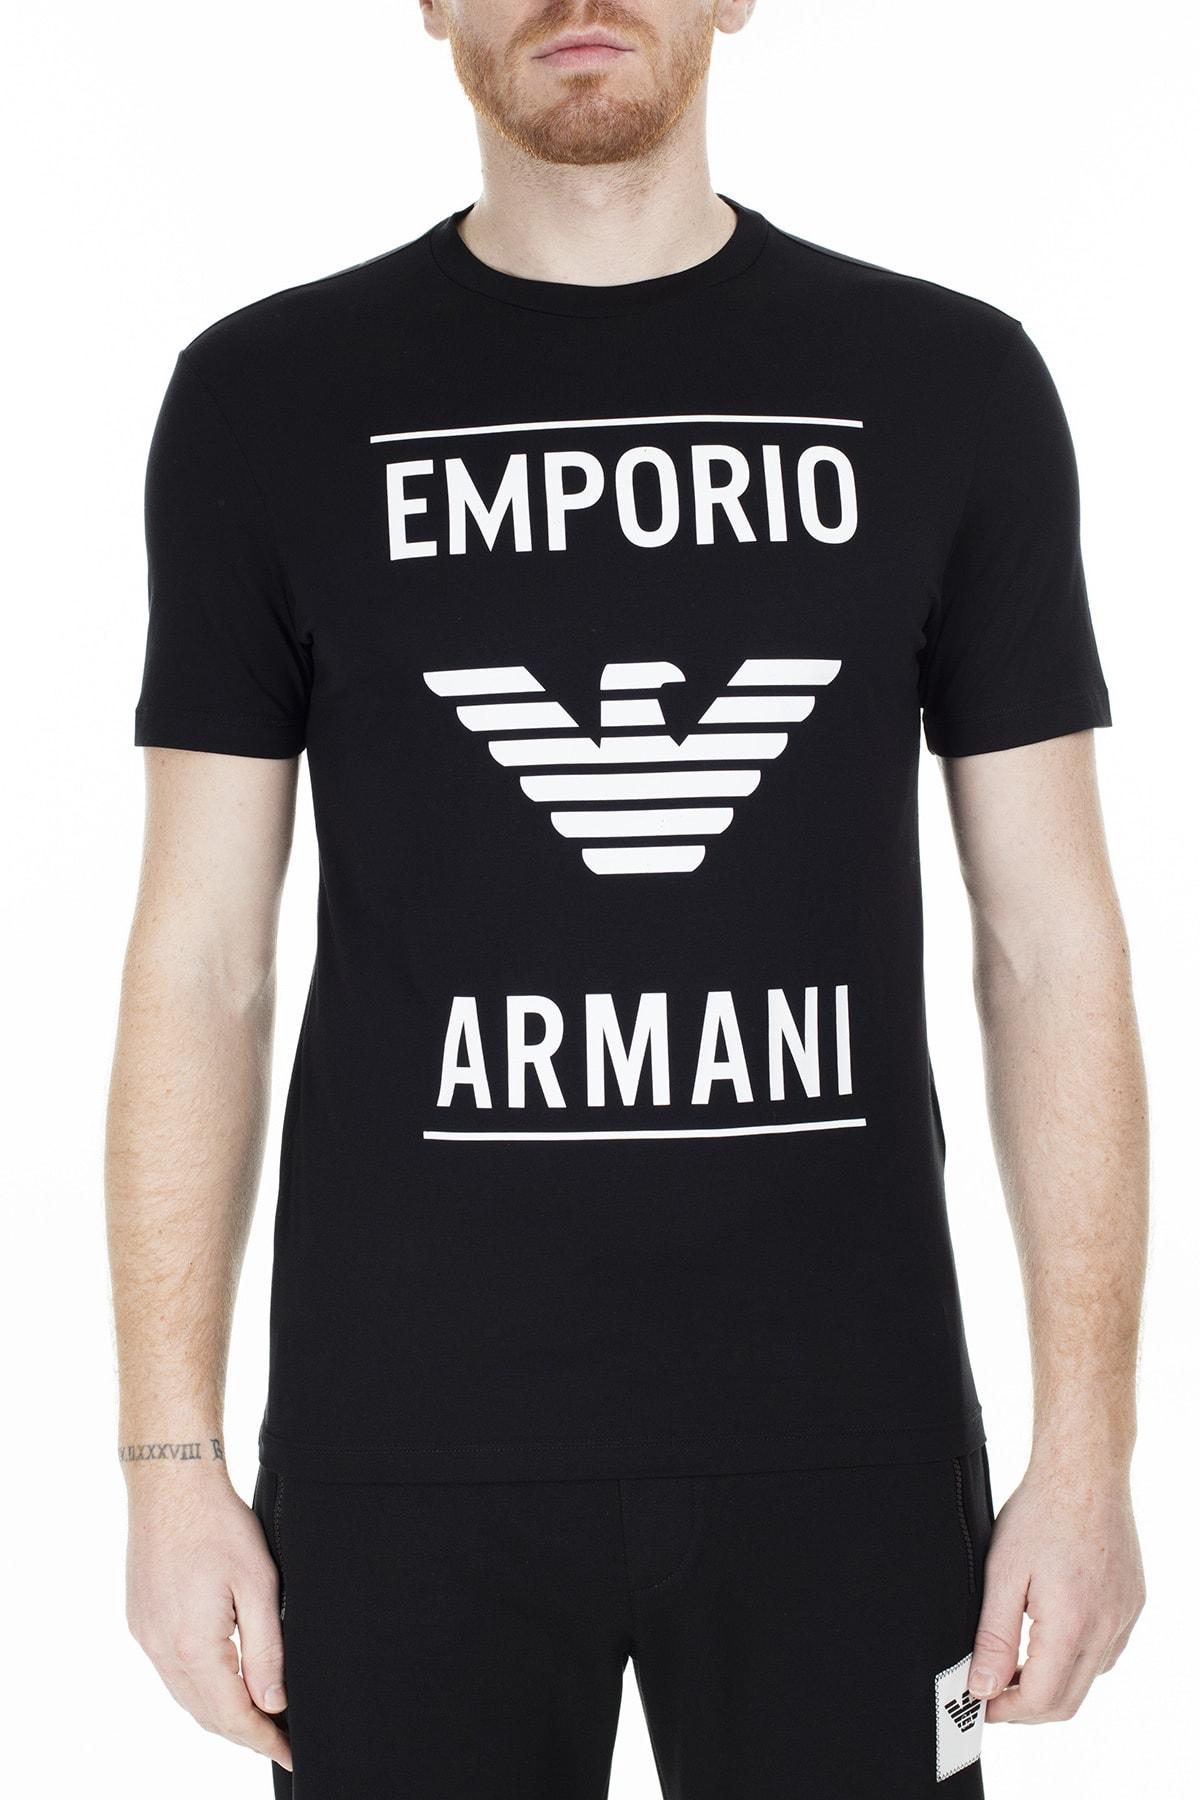 Emporio Armani T Shirt Erkek T Shirt S 6G1Te7 1Jnqz 0999 S 6G1TE7 1JNQZ 0999 0